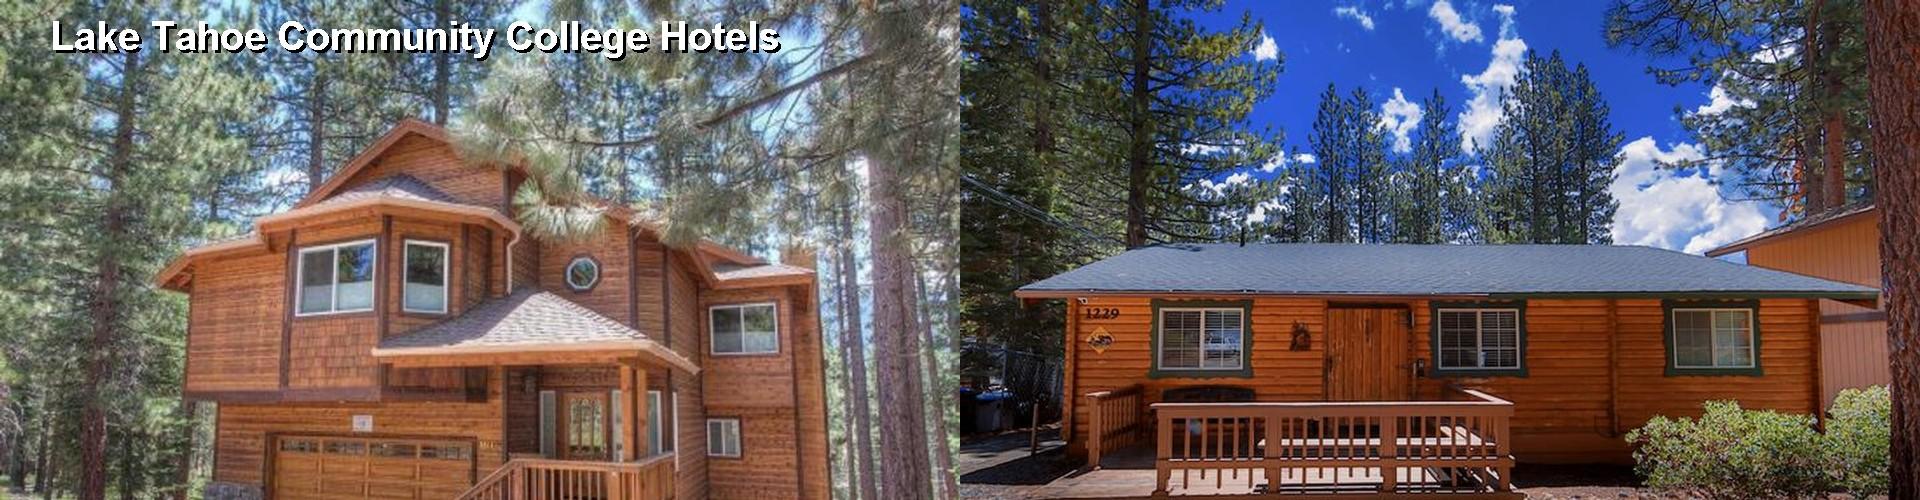 Best Kitchen Gallery: 63 Hotels Near Lake Tahoe Munity College In South Lake Tahoe Ca of Hotels Near Heavenly Ski Resort  on rachelxblog.com